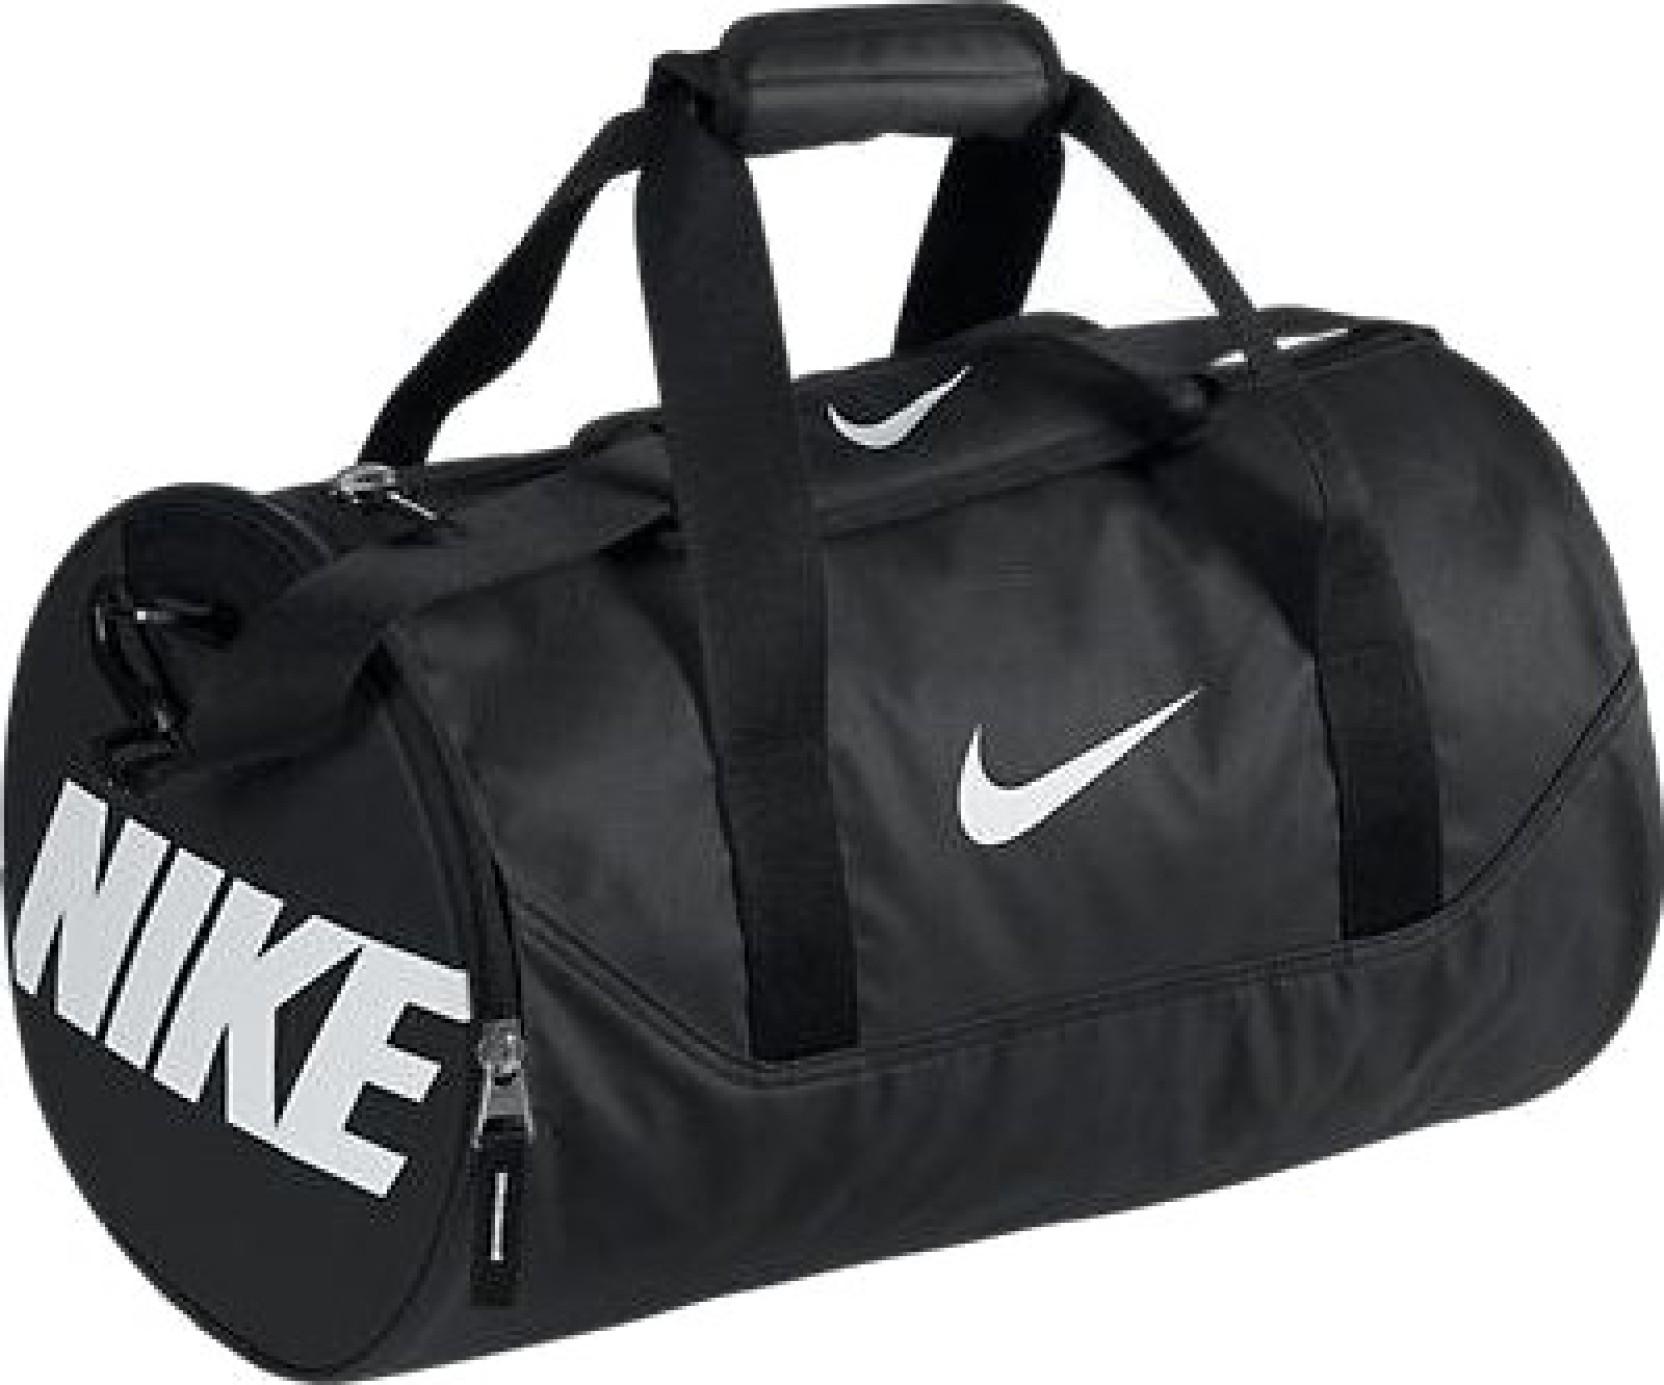 Buy Nike Gym Bags Online India- Fenix Toulouse Handball c2740ff7fa398